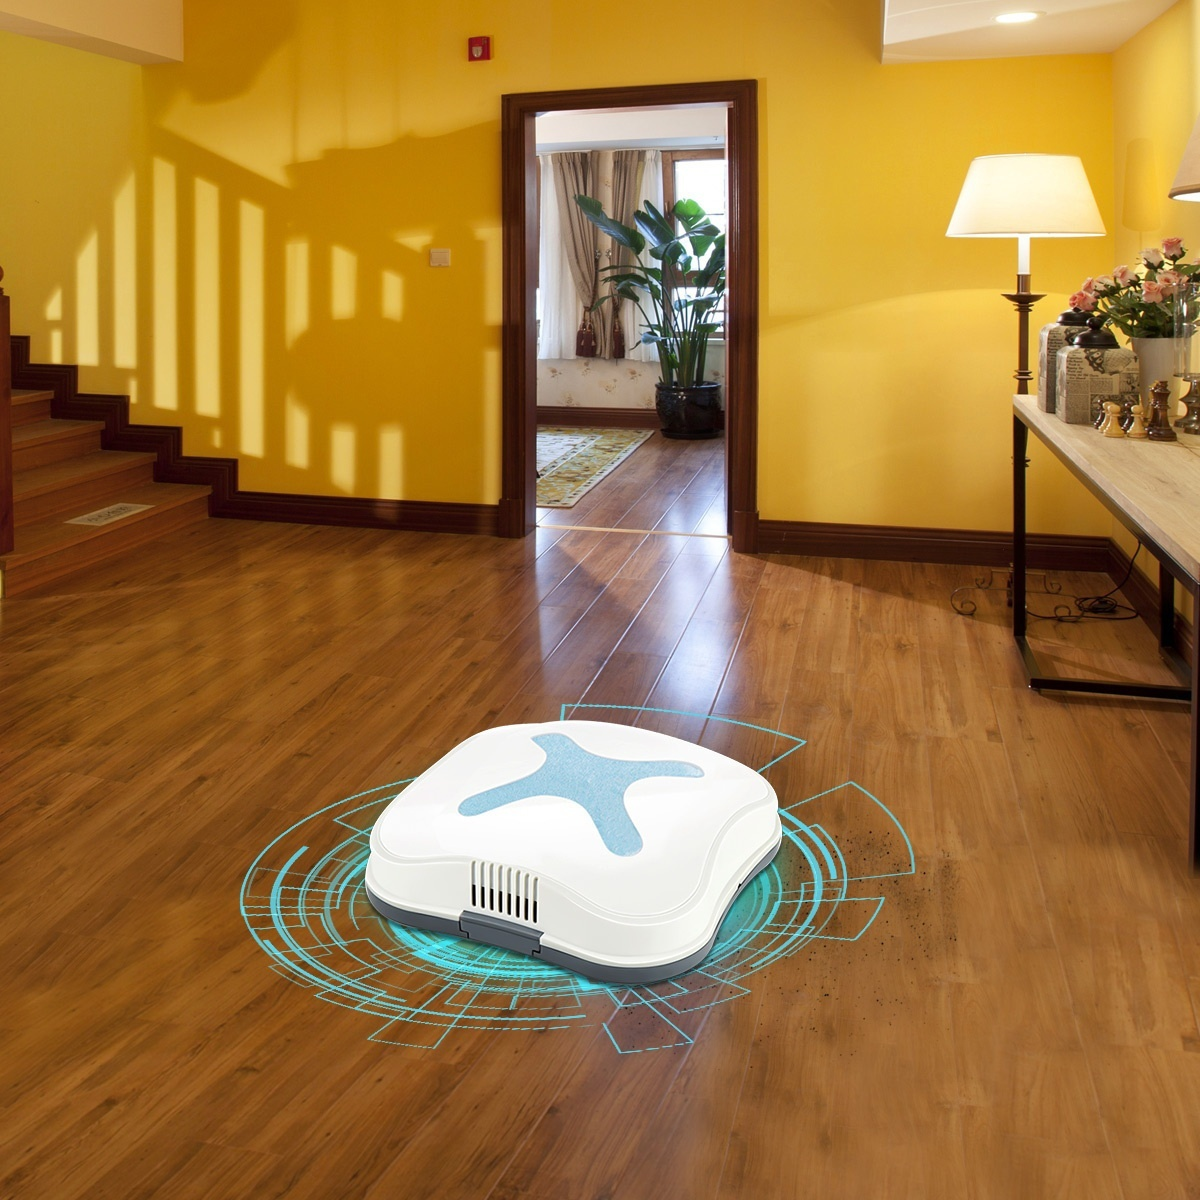 Automatic Smart Sweeping Robot Vacuum Robotic Cleaner Floor Dust USB Rechargeable Sweeping MachineAutomatic Smart Sweeping Robot Vacuum Robotic Cleaner Floor Dust USB Rechargeable Sweeping Machine